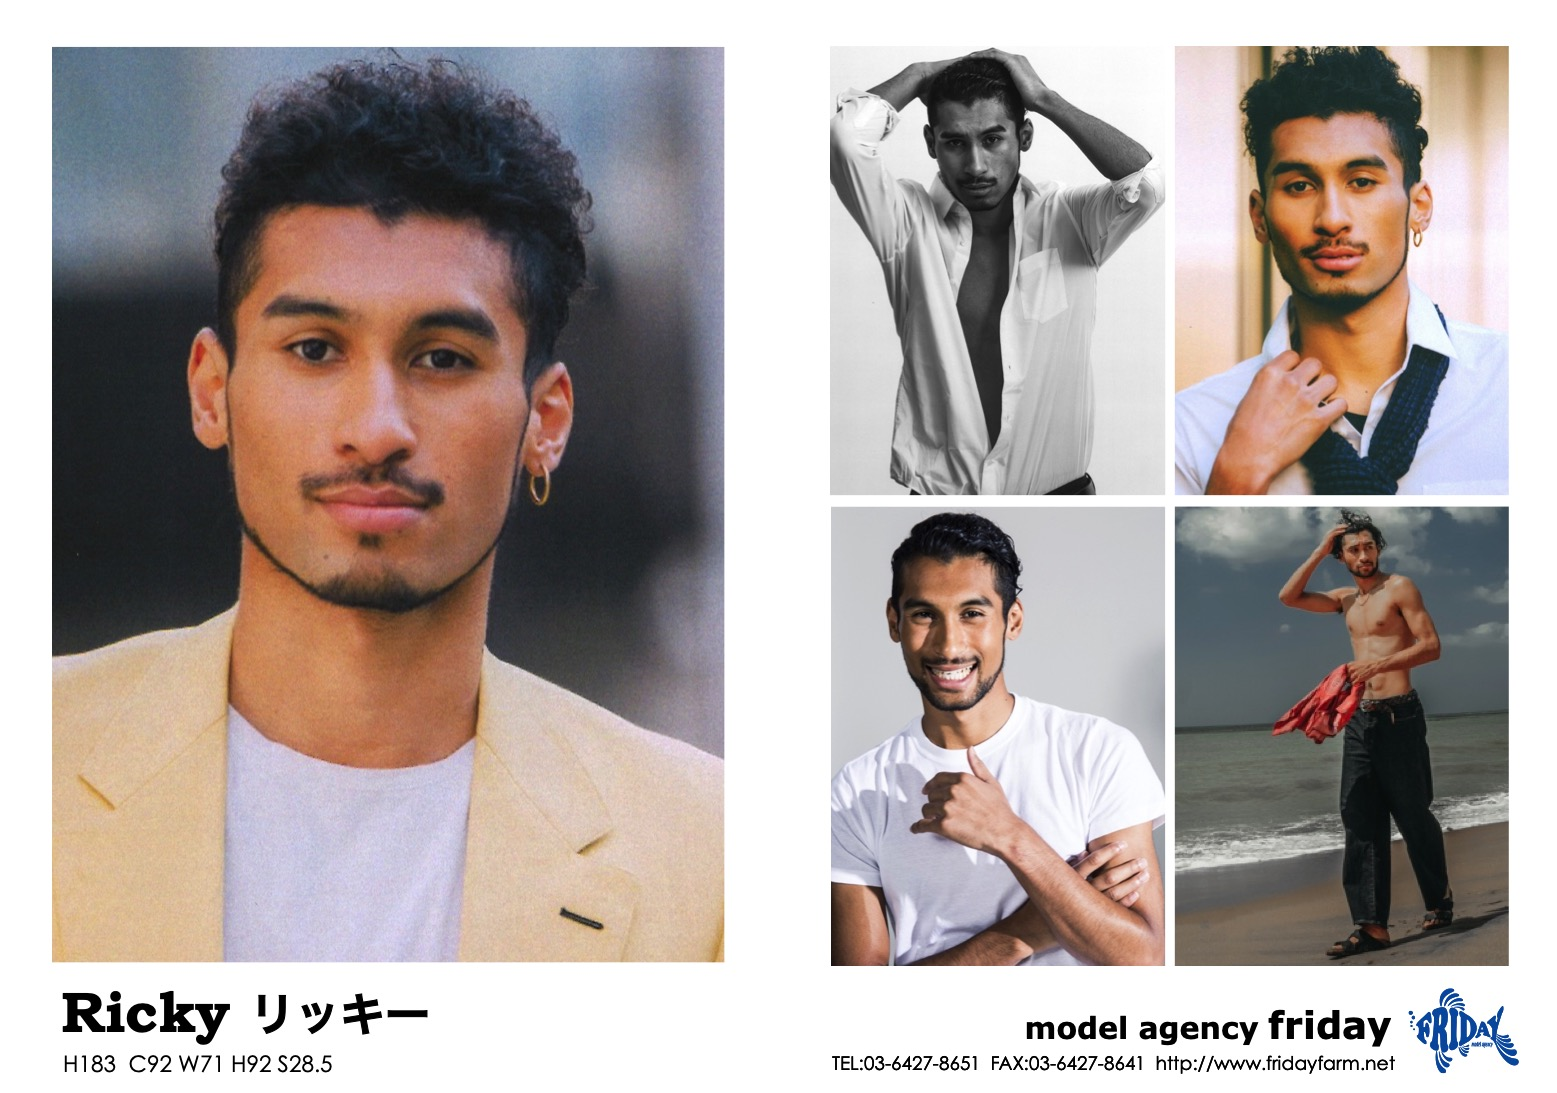 Ricky - リッキー | model agency friday